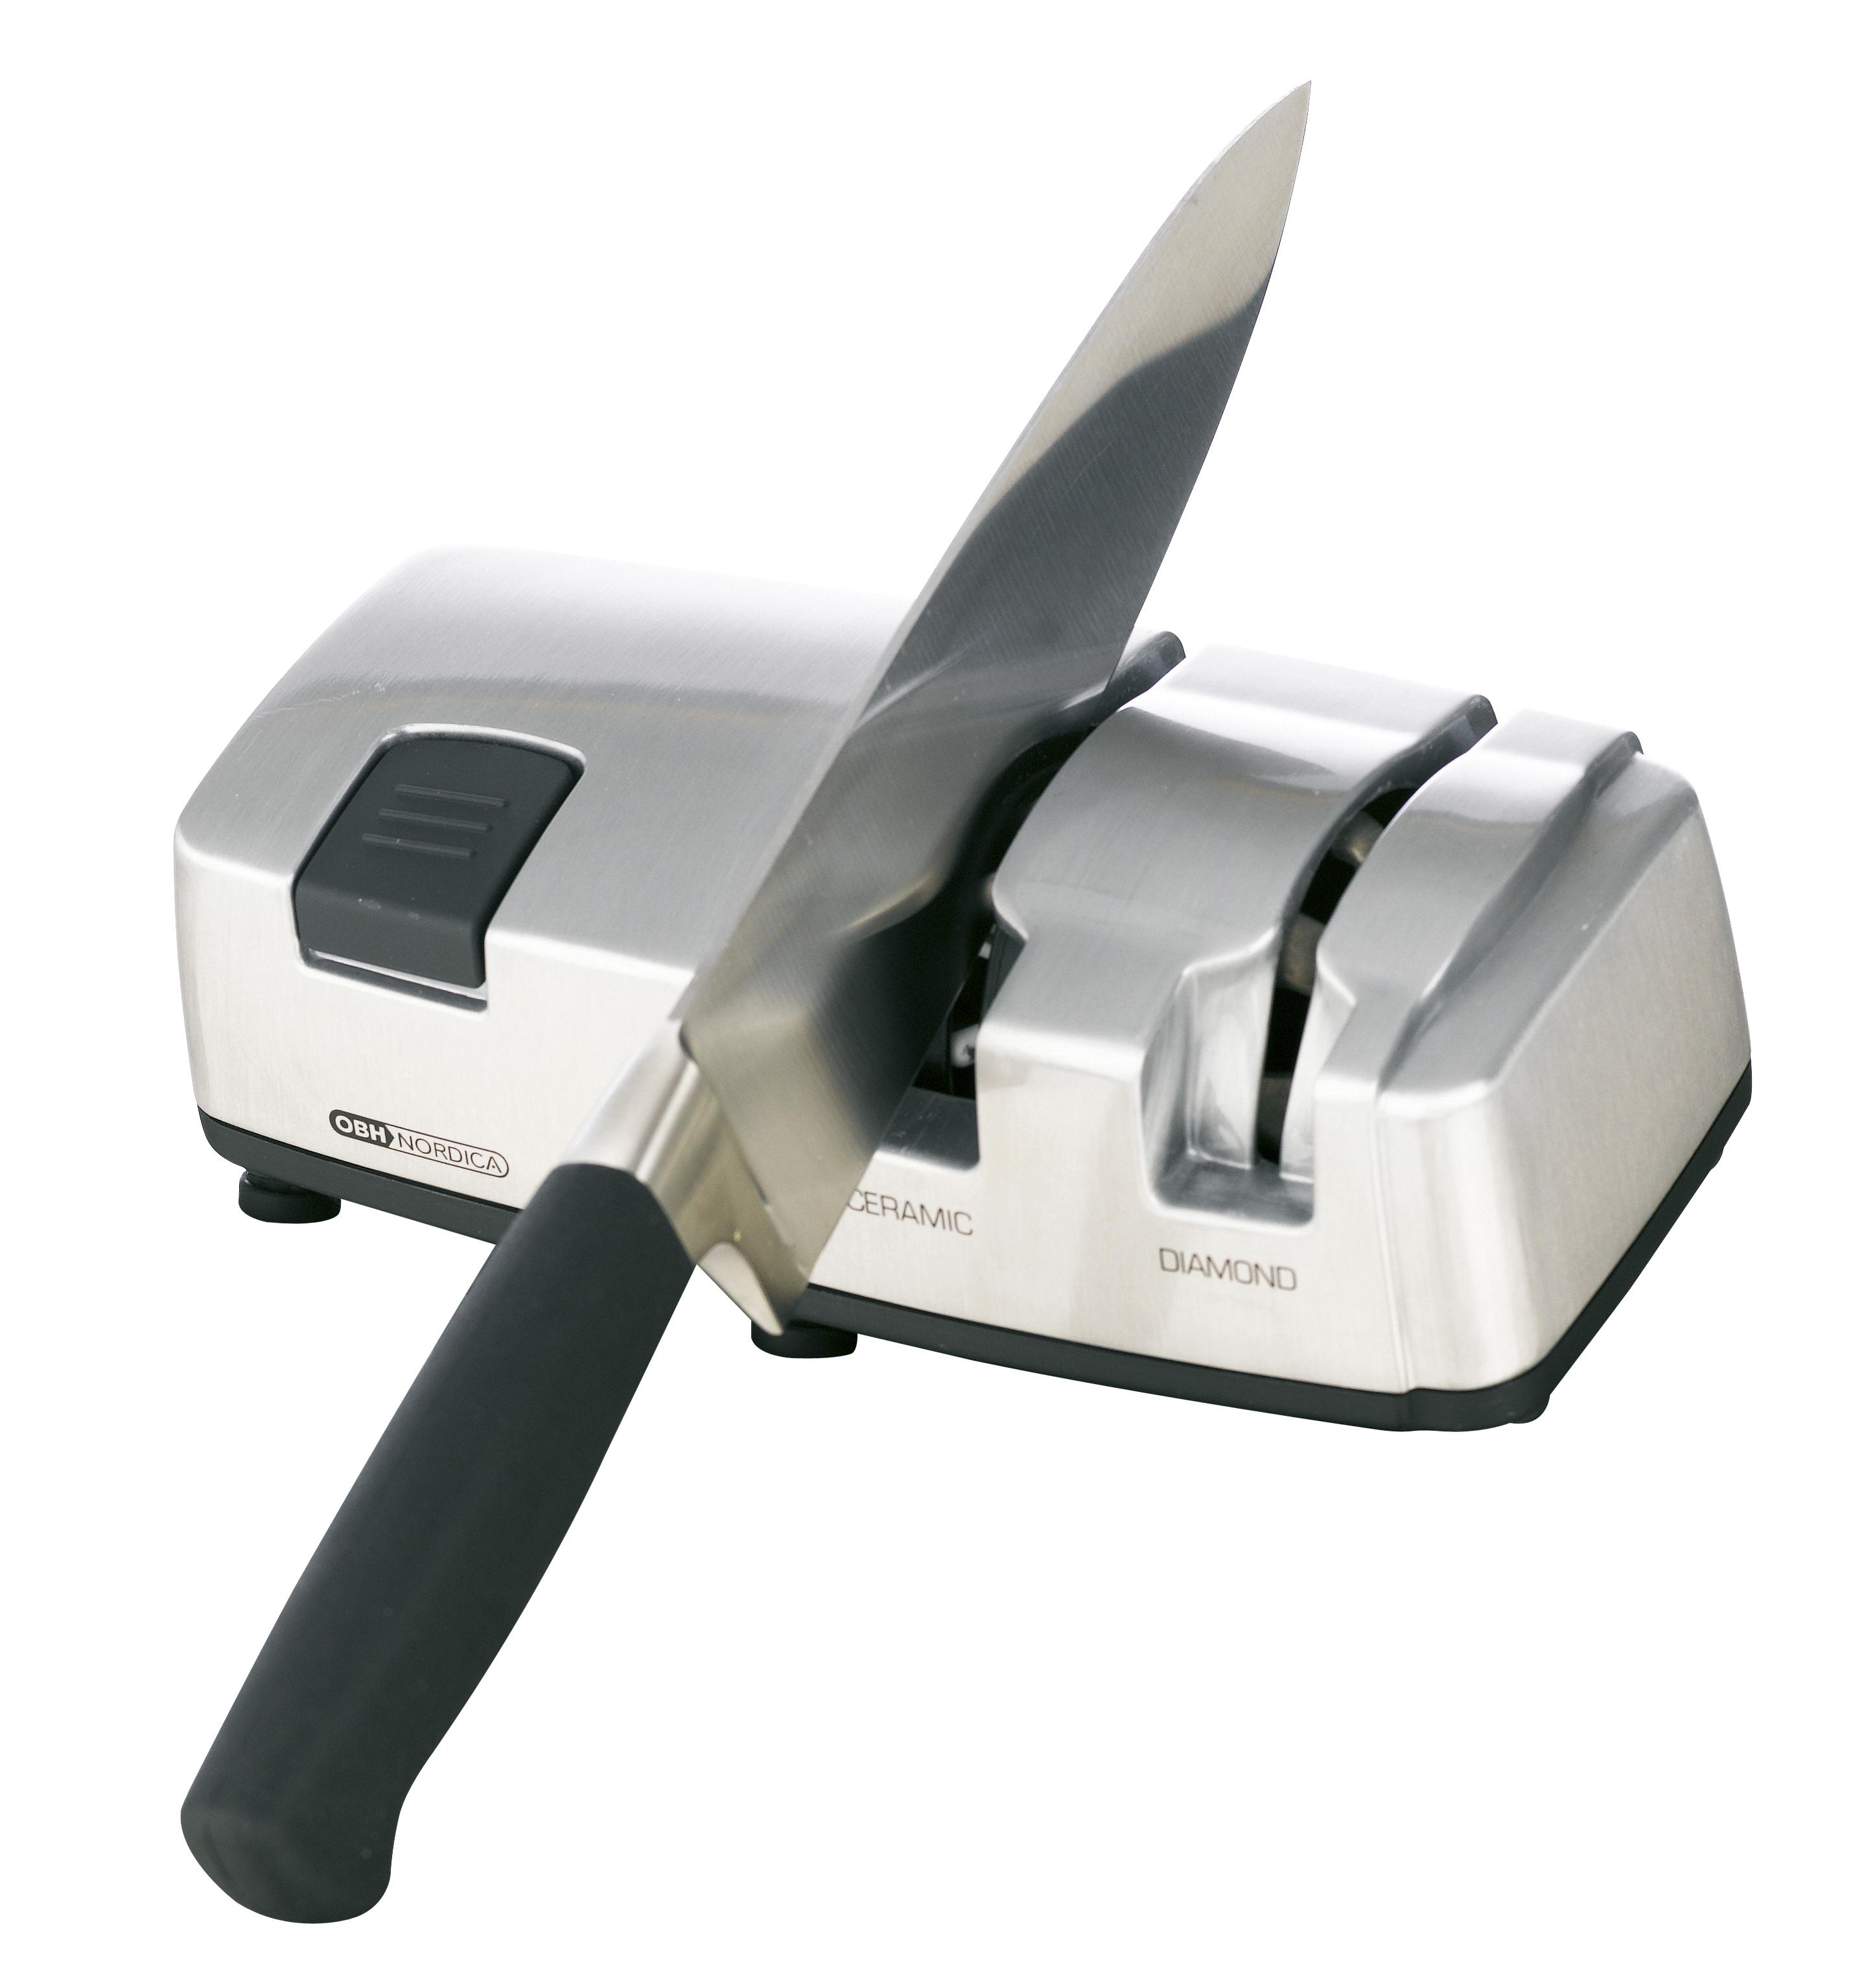 OBH Nordica SharpX-treme Knivslip